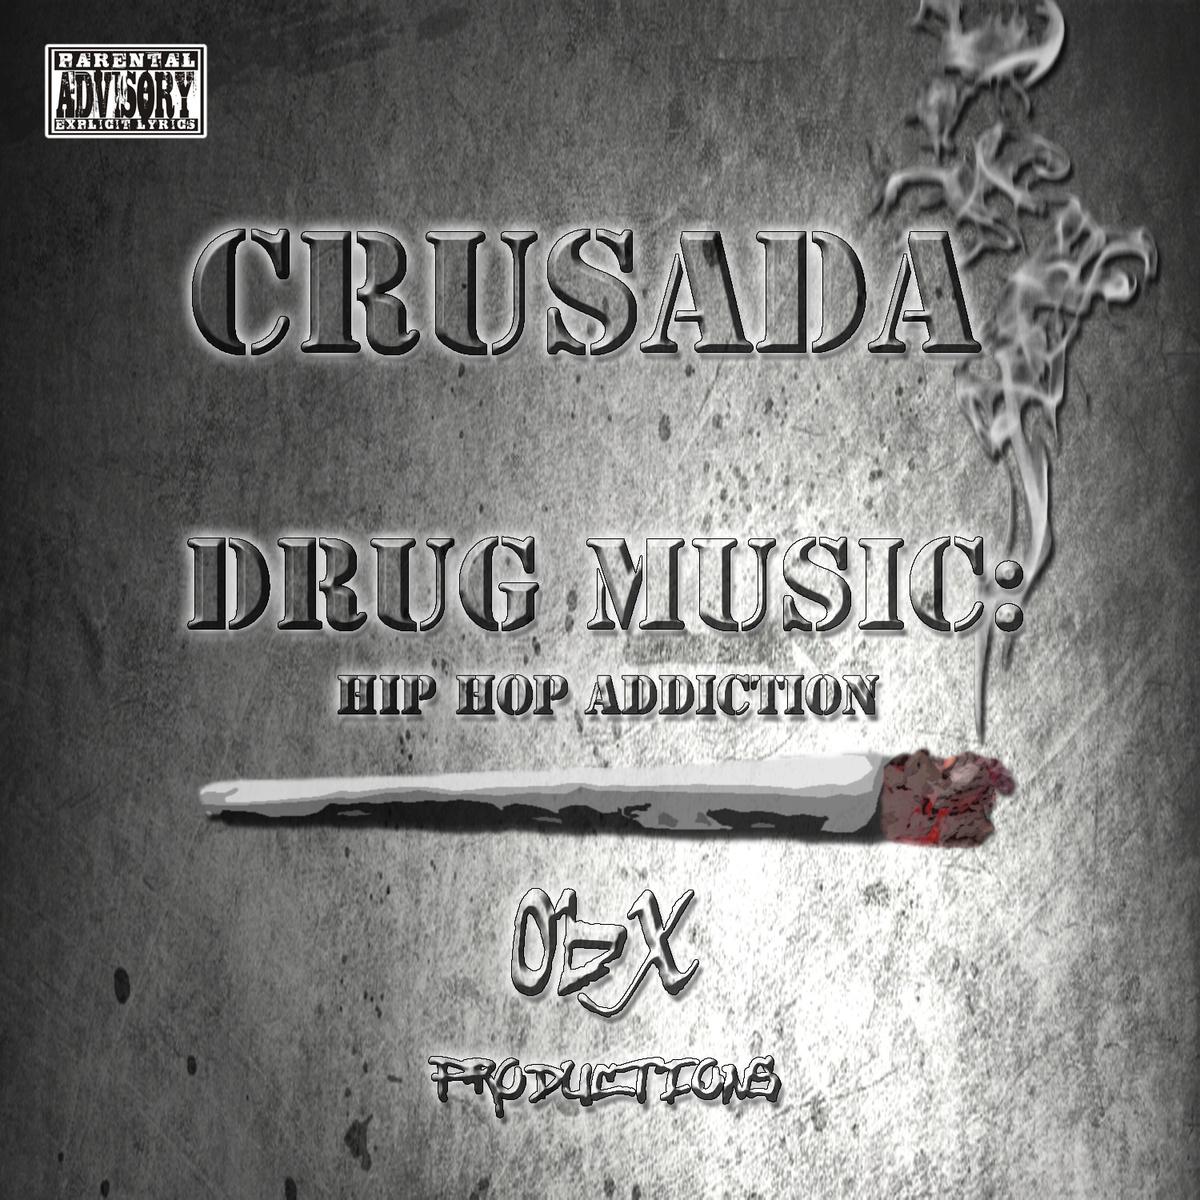 Crusada - Drug Music - Hip Hop Addiction